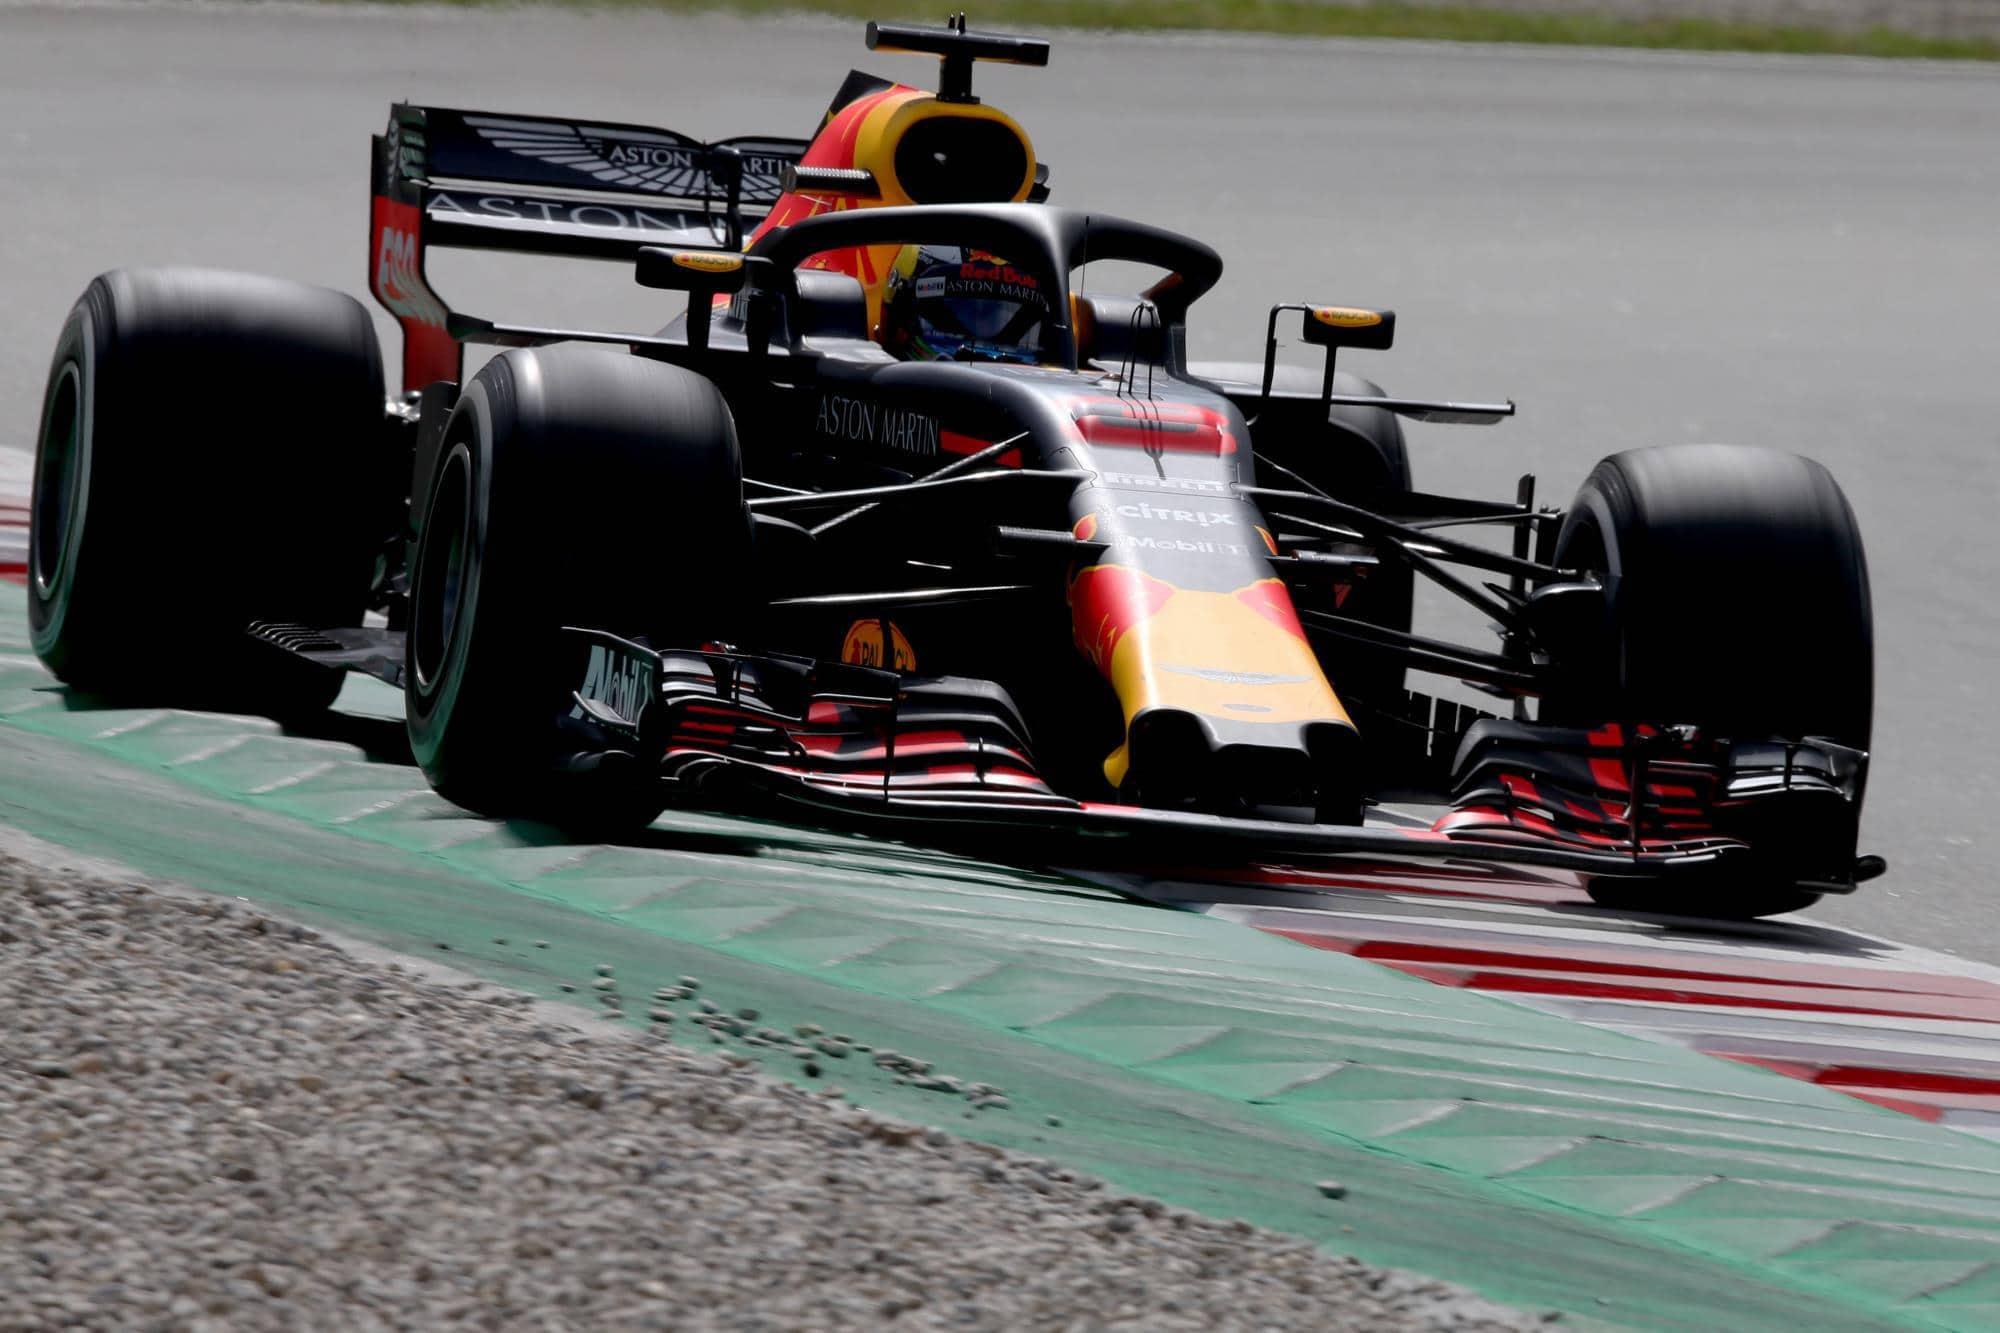 Daniel Ricciardo Red Bull RB14 Spanish GP F1 2018 Photo Red Bull